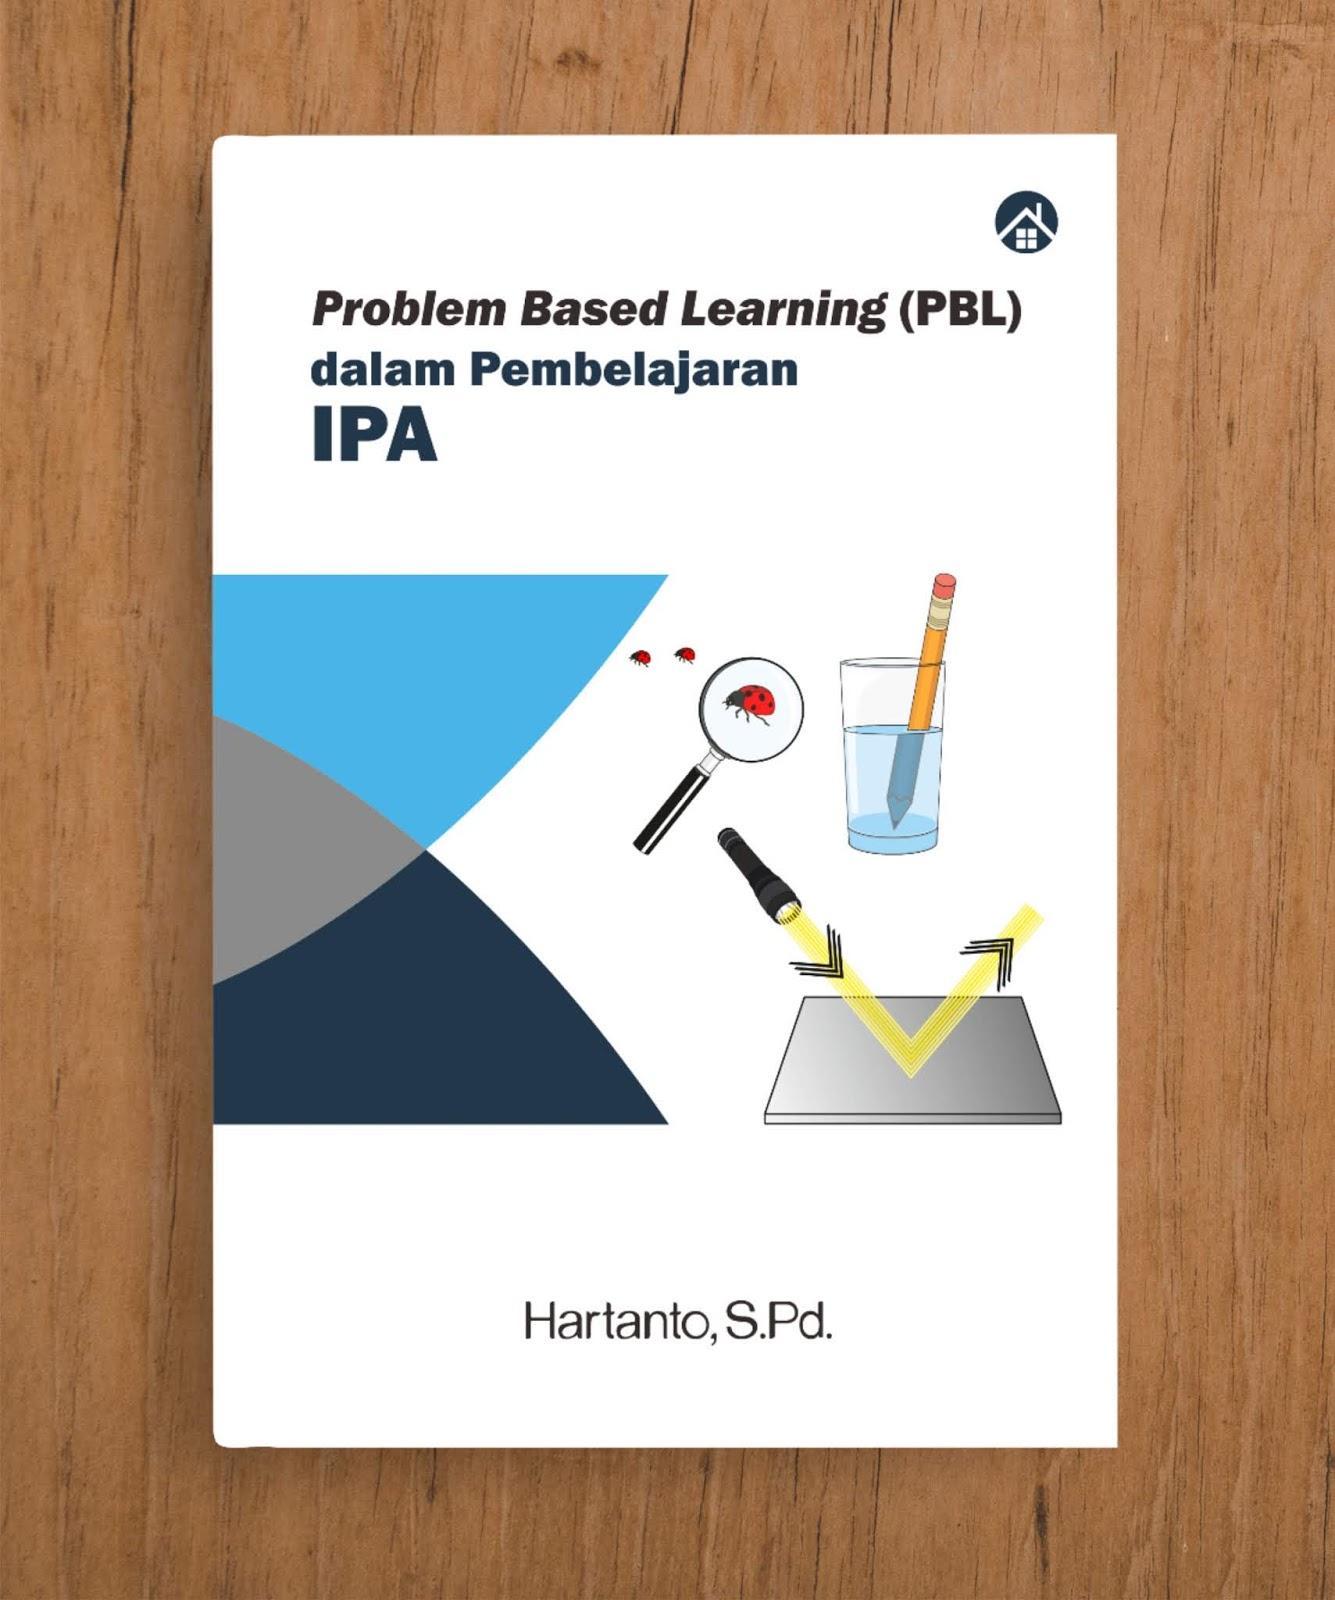 Problem Based Learning (PBL) dalam Pembelajaran IPA